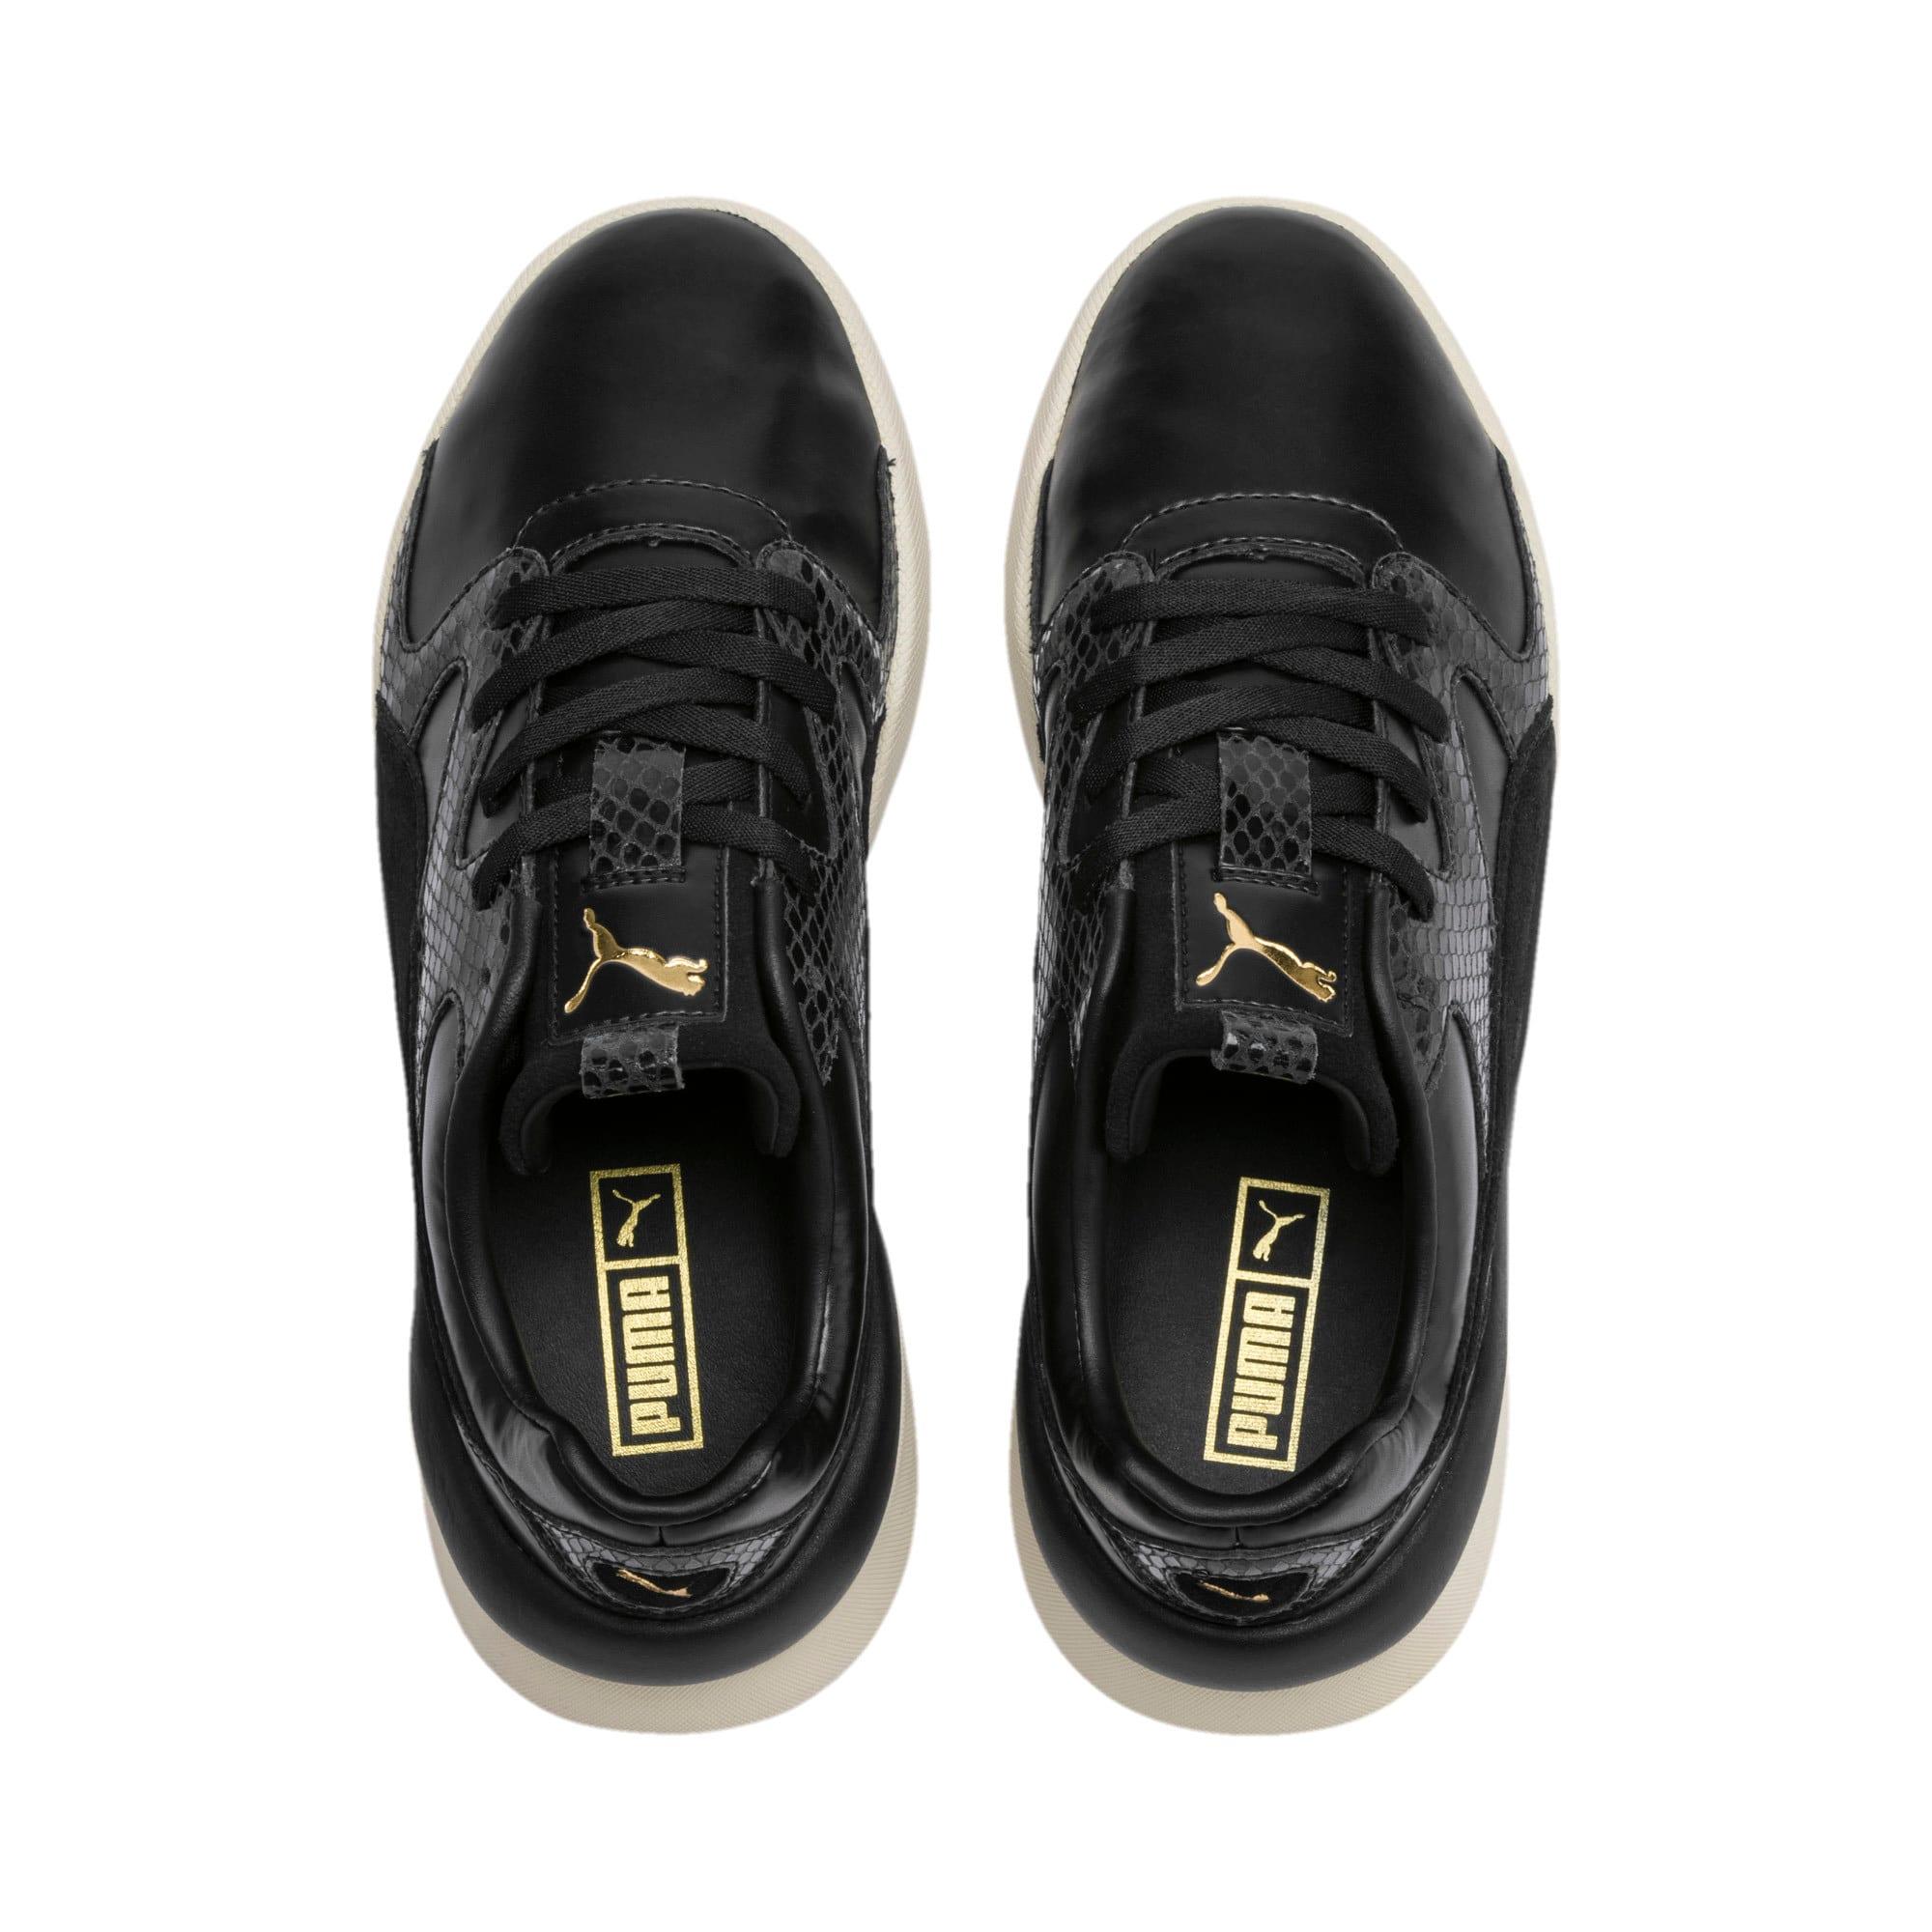 Thumbnail 7 of Aeon Play Women's Sneakers, Puma Black, medium